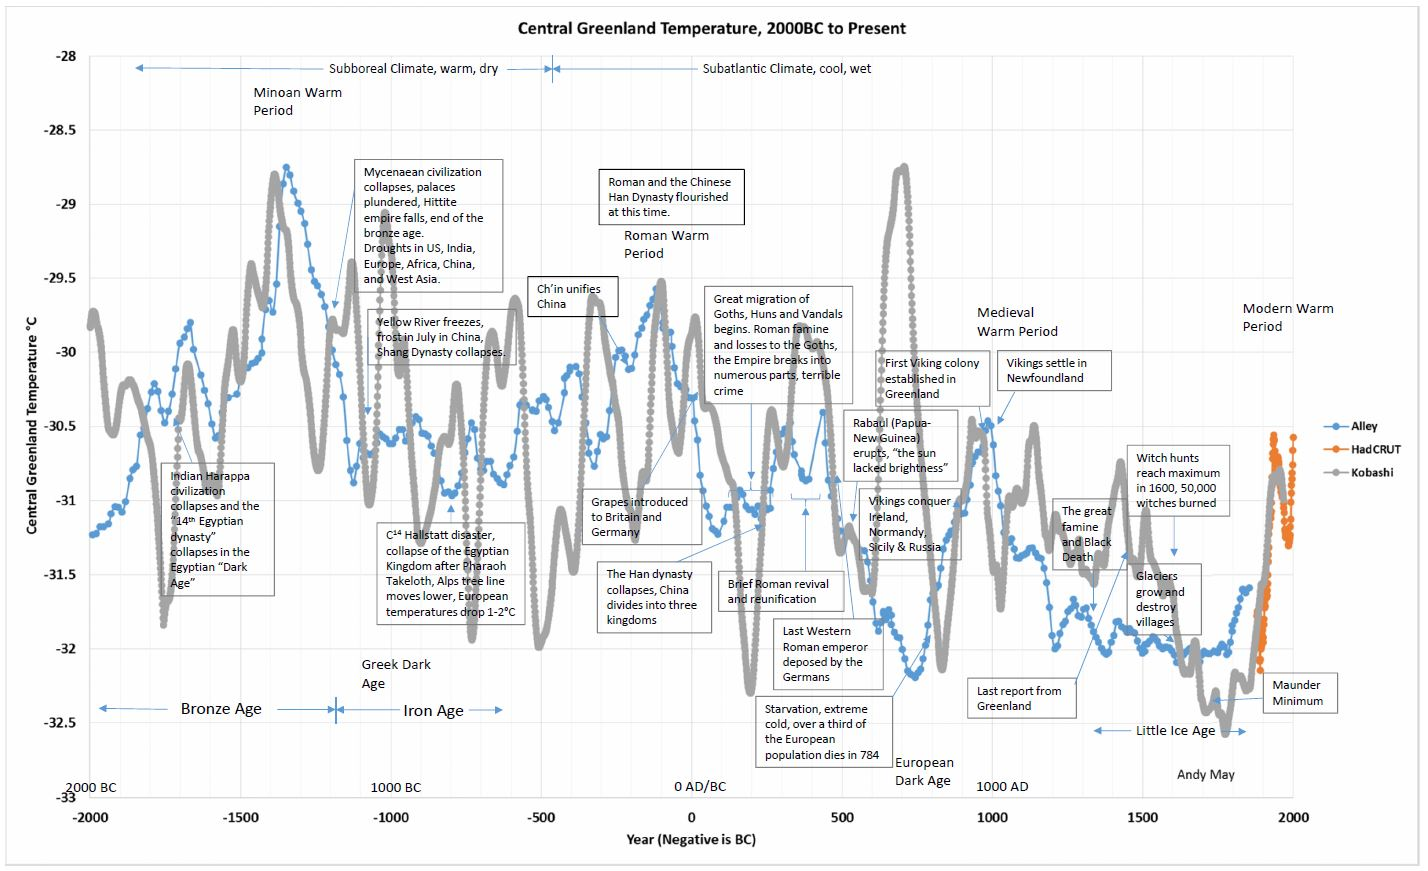 kobashi_central_greenland_temperatures-society.jpg